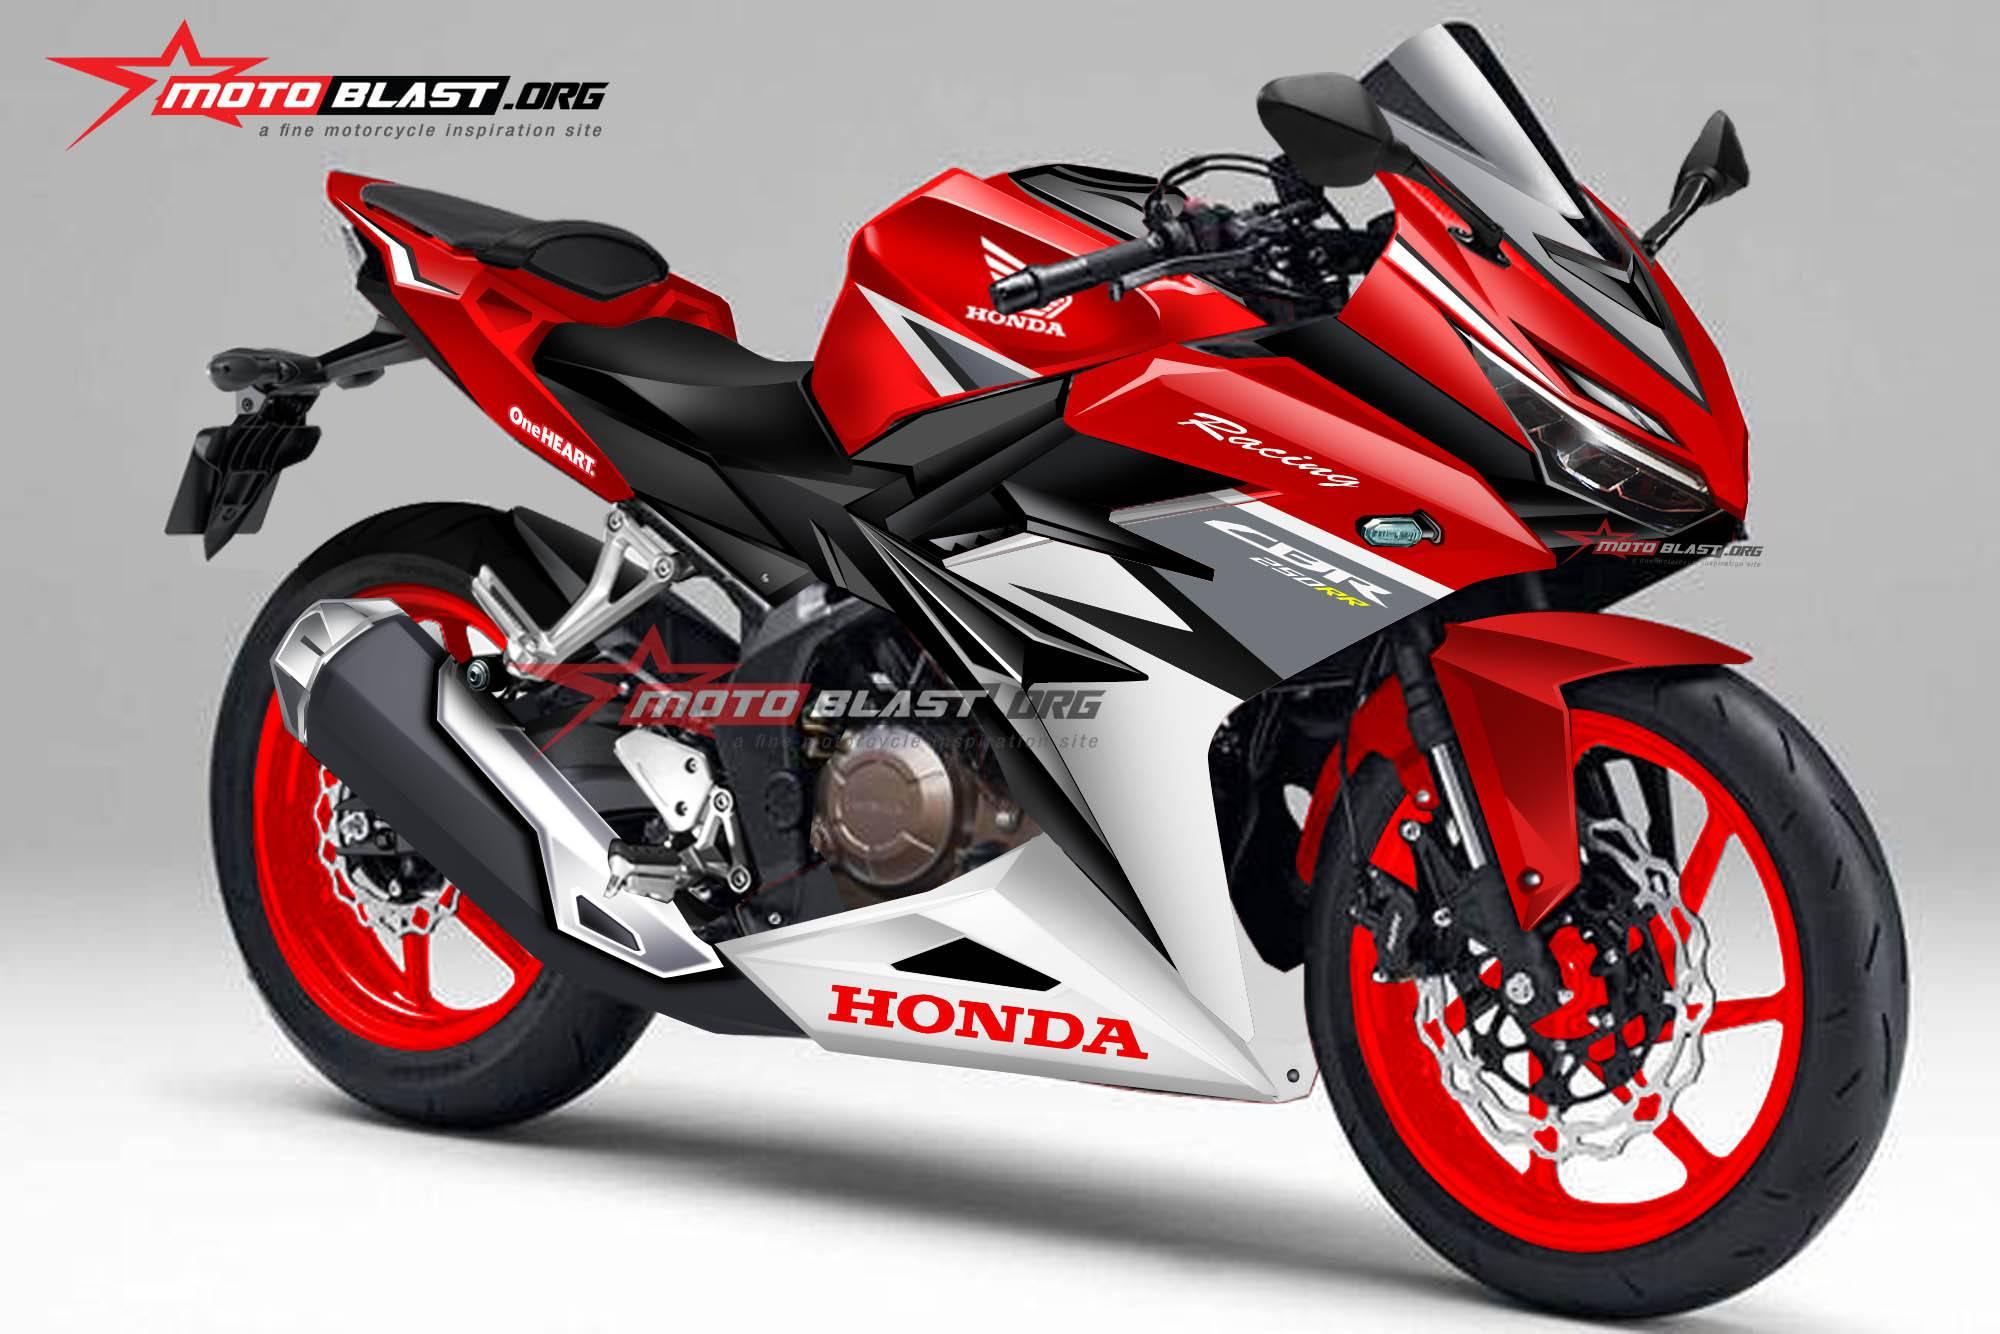 2017 Honda CBR350RR & CBR250RR = New CBR Model Lineup